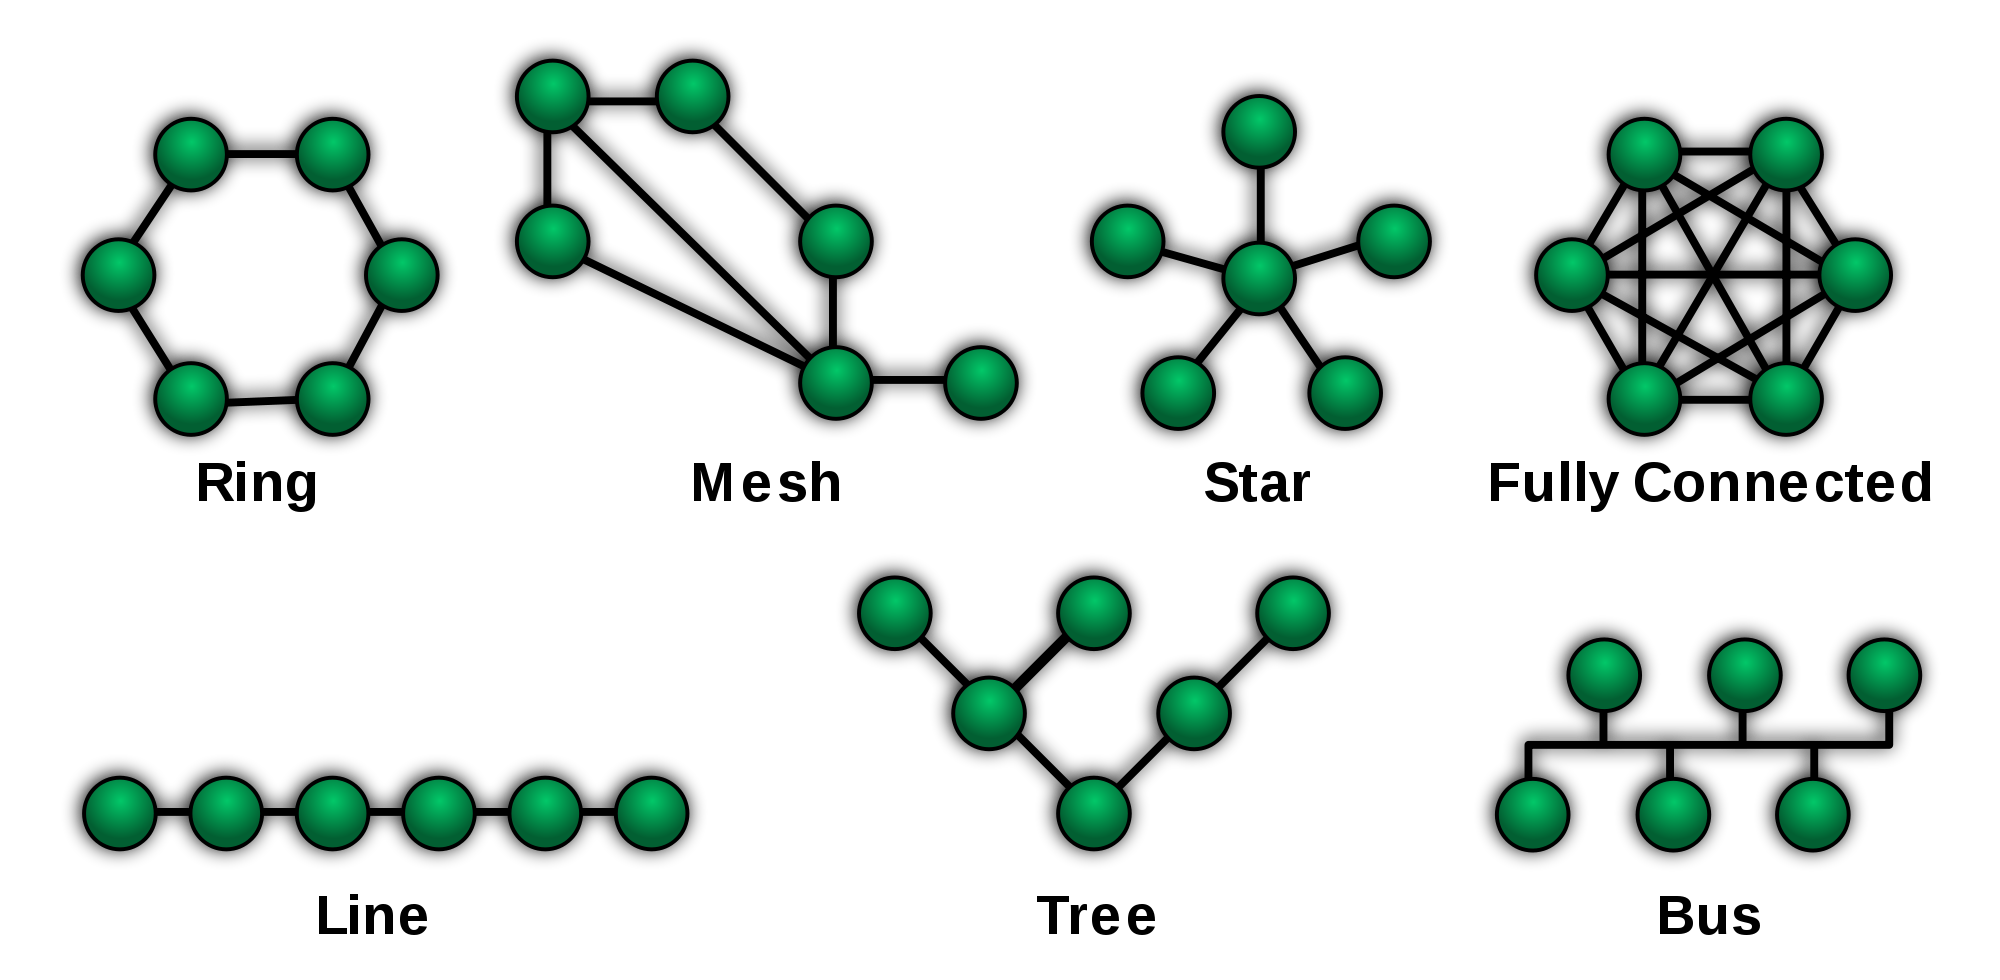 Network cabling, NetworkTopologies.